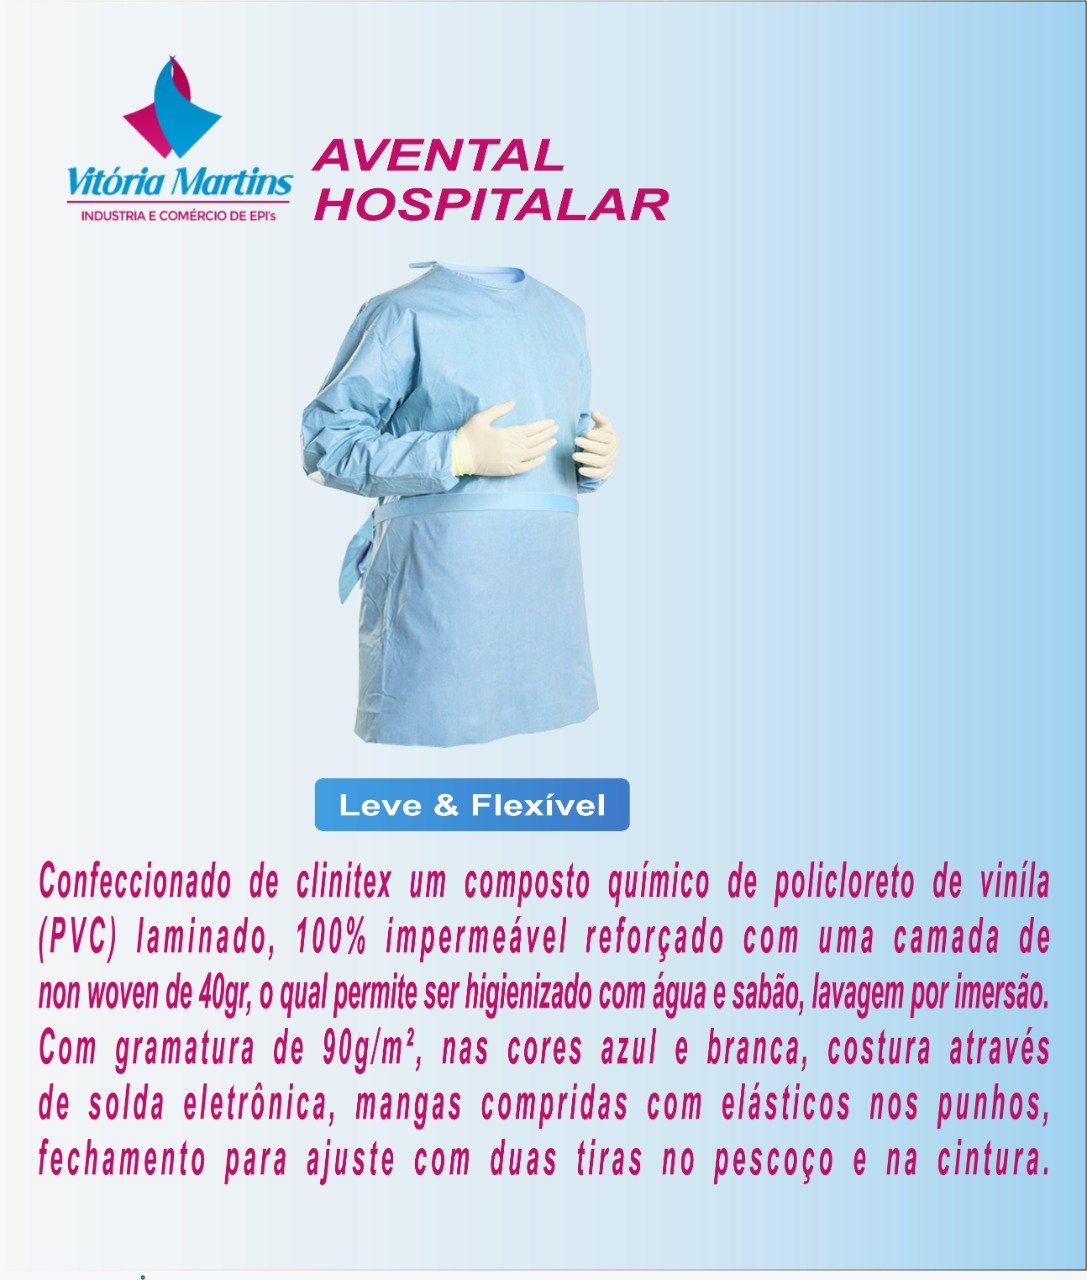 AVENTAL HOSPITALAR